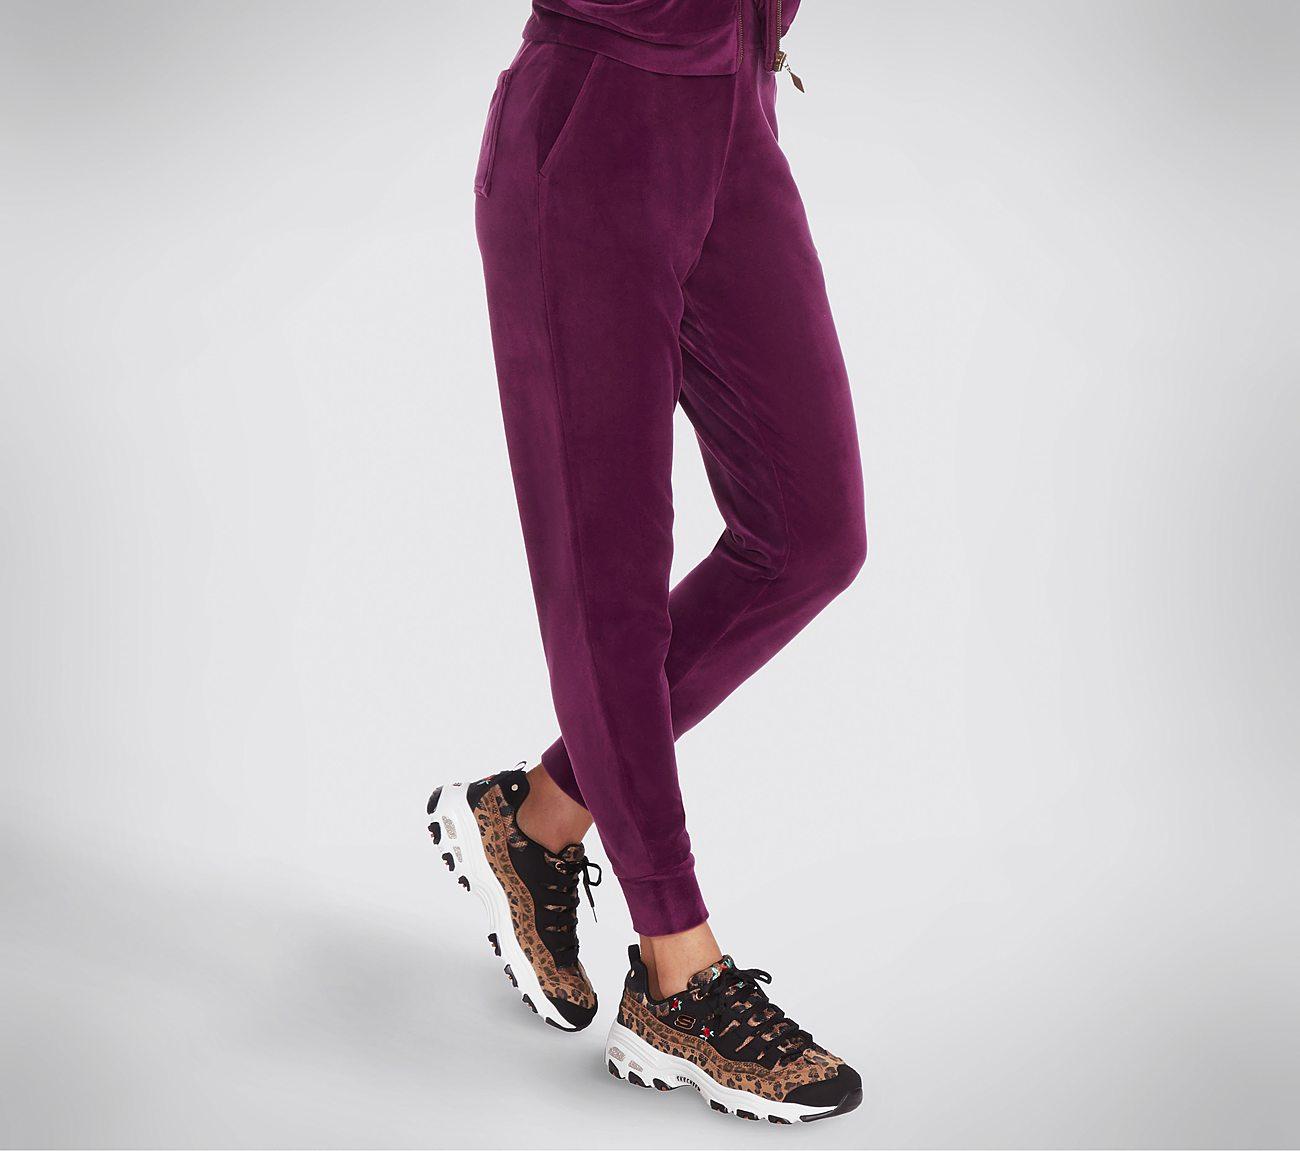 Skechers Apparel Highlight Jogger Pant